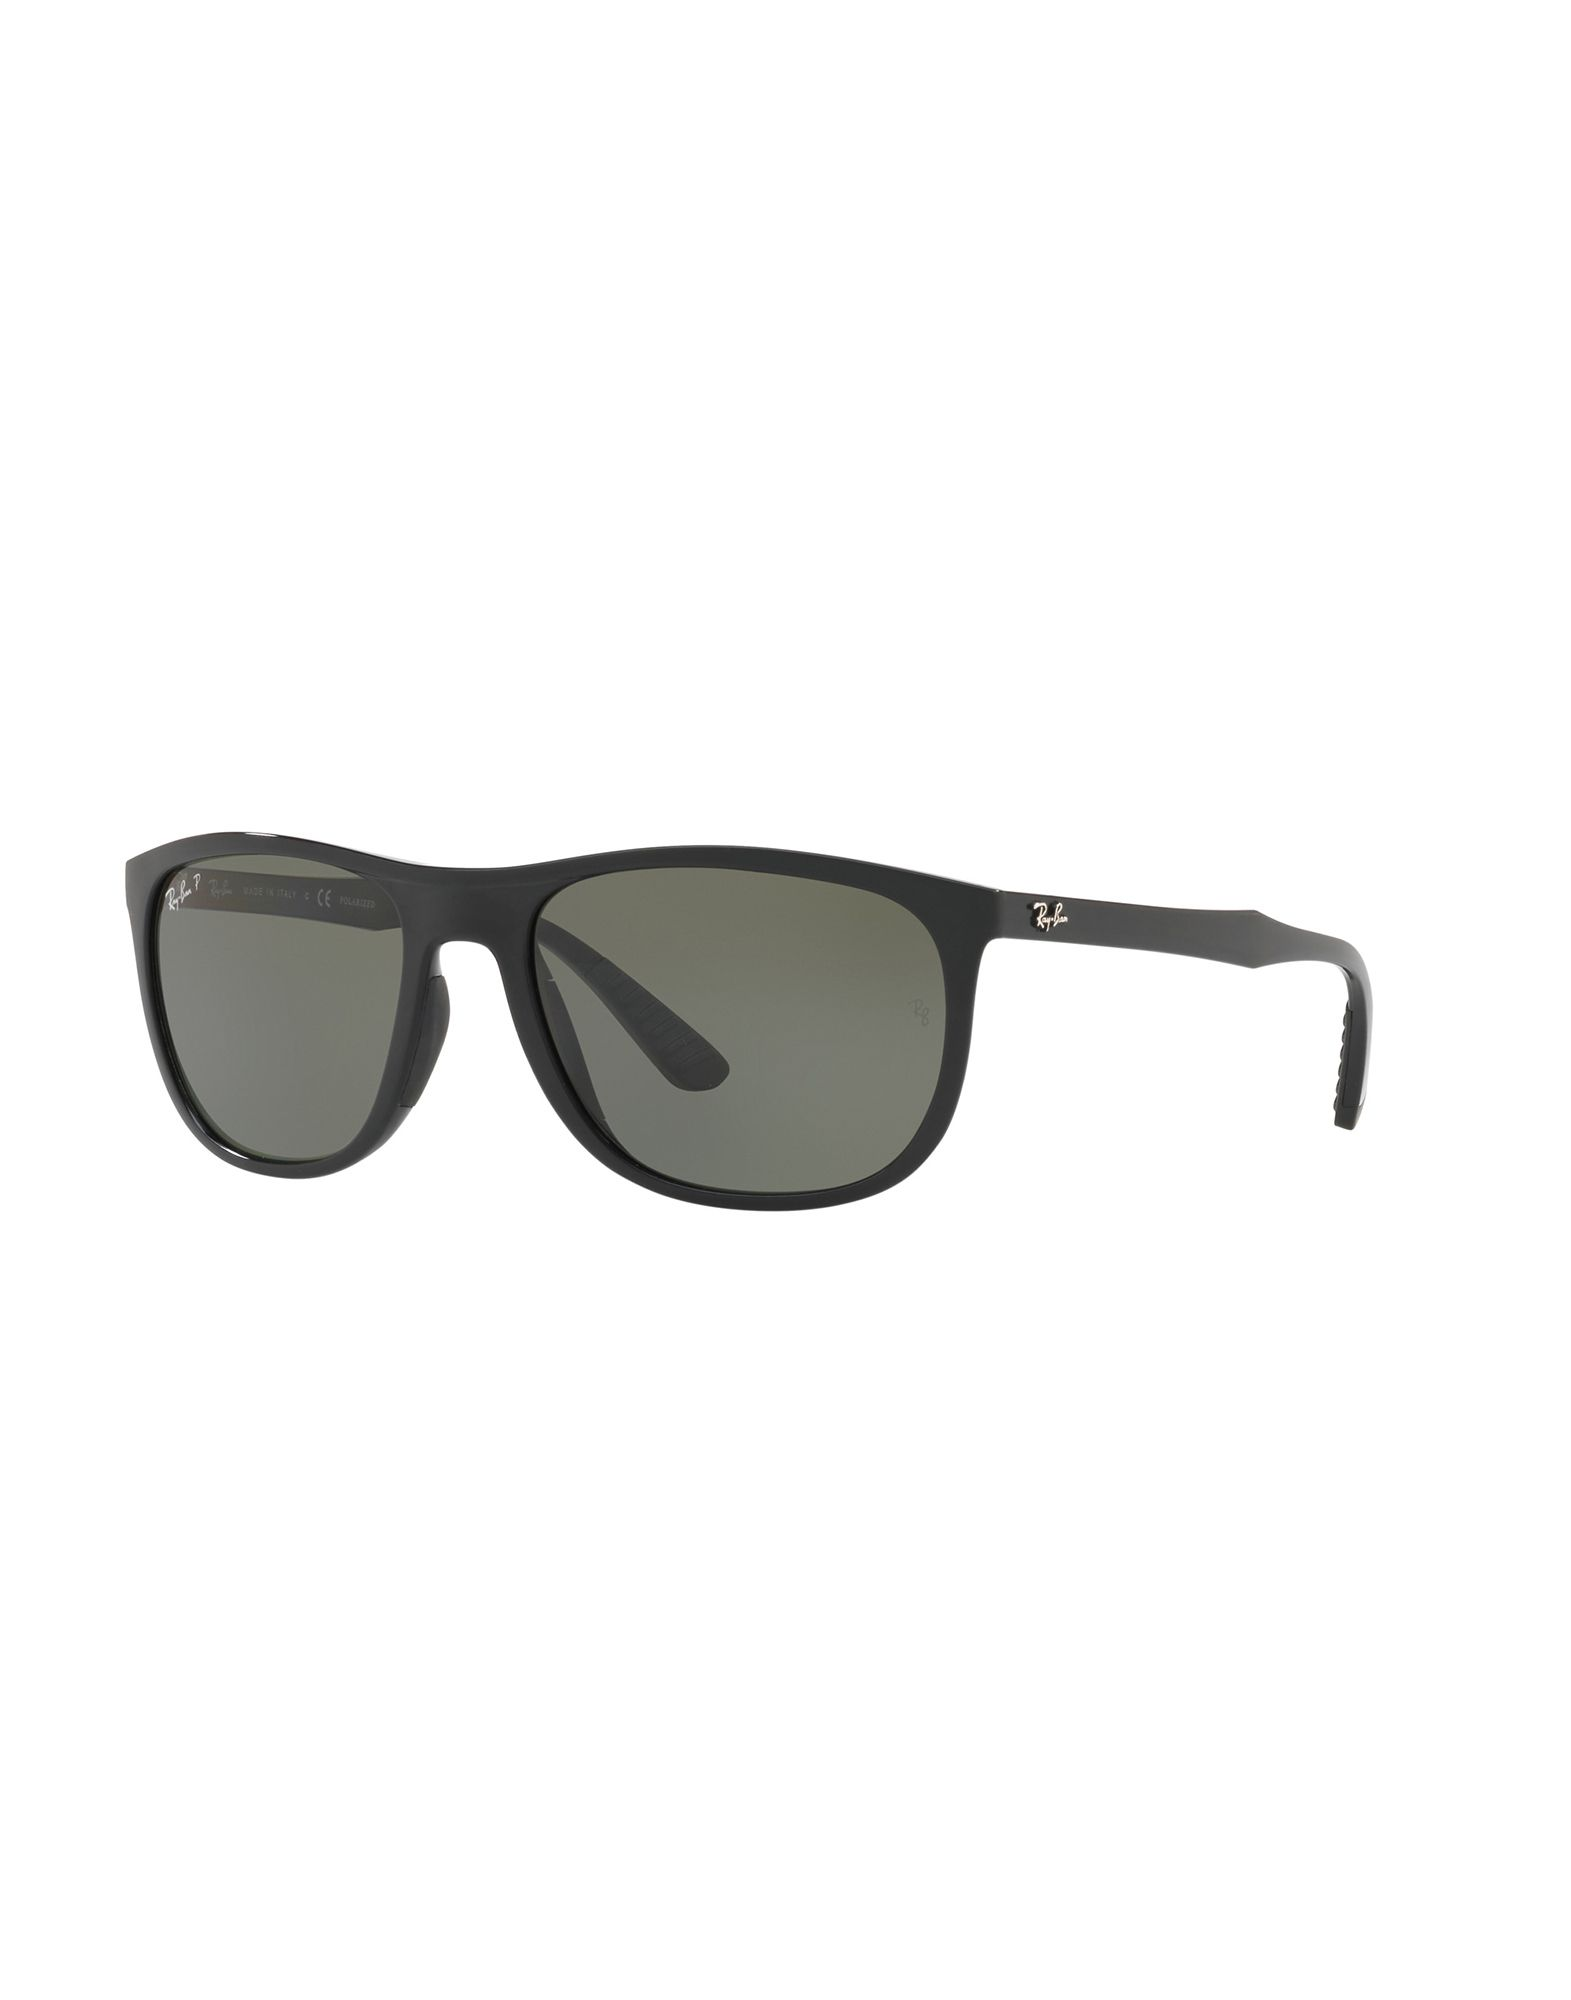 RAY-BAN Солнечные очки очки drivers club поляризационные dc60450g